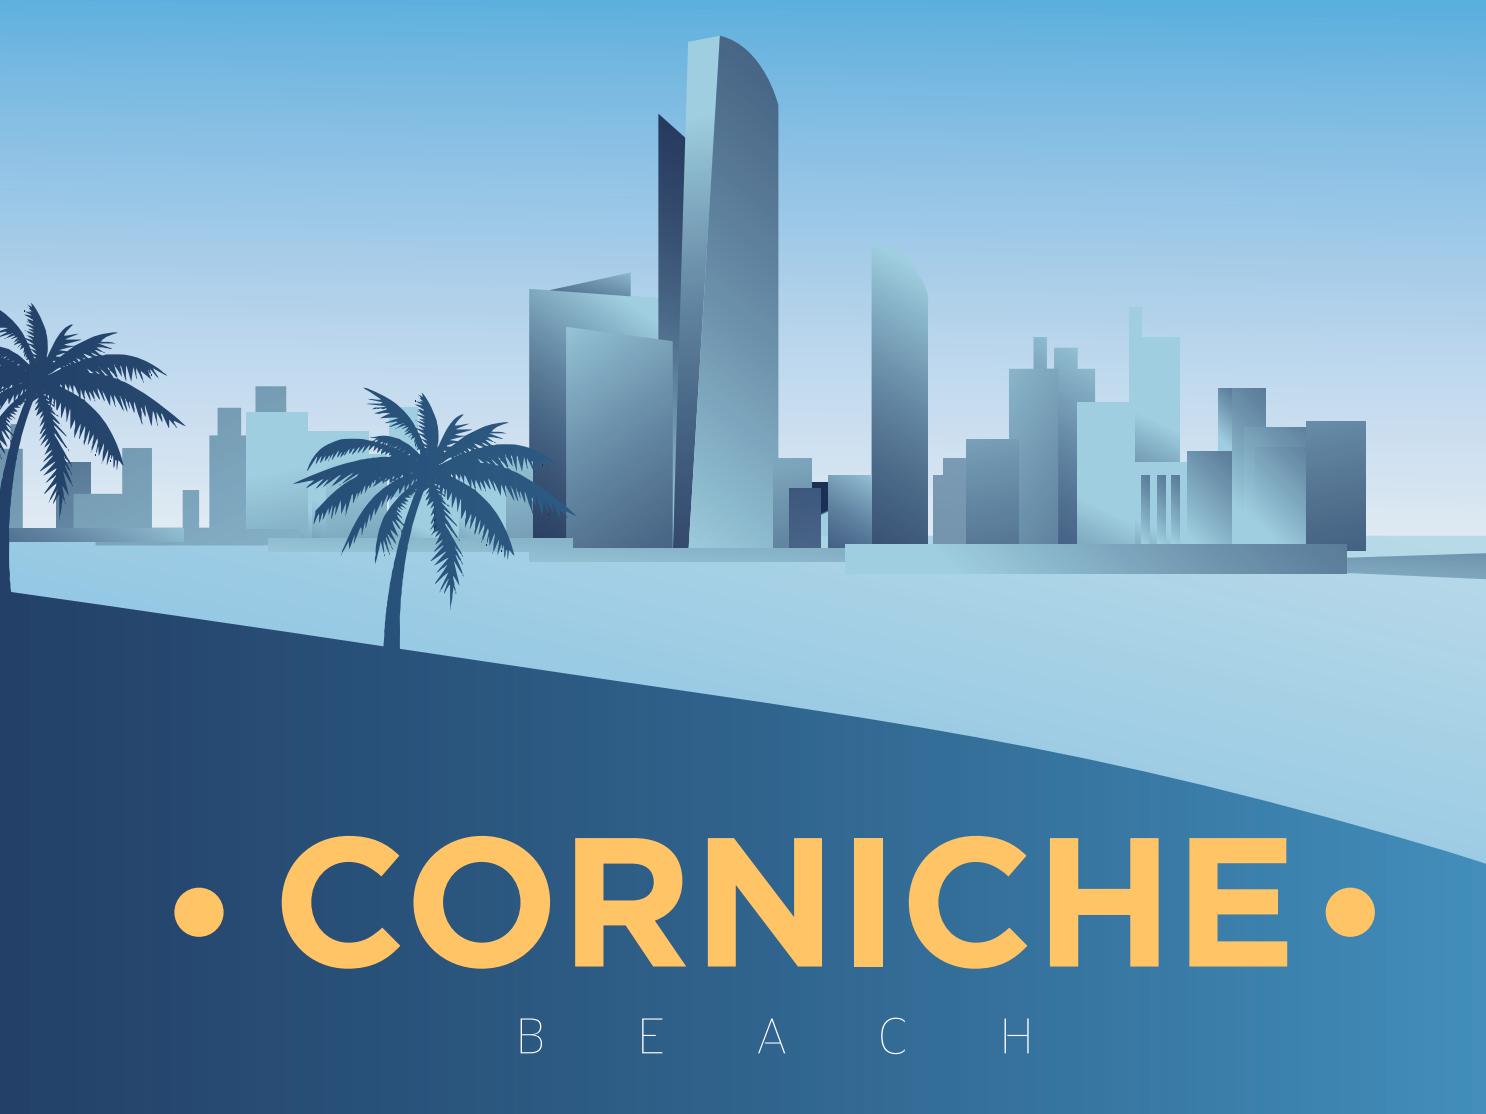 Corniche Beach skyline arabian abu dhabi abudhabi landscape art vector corniche illustration